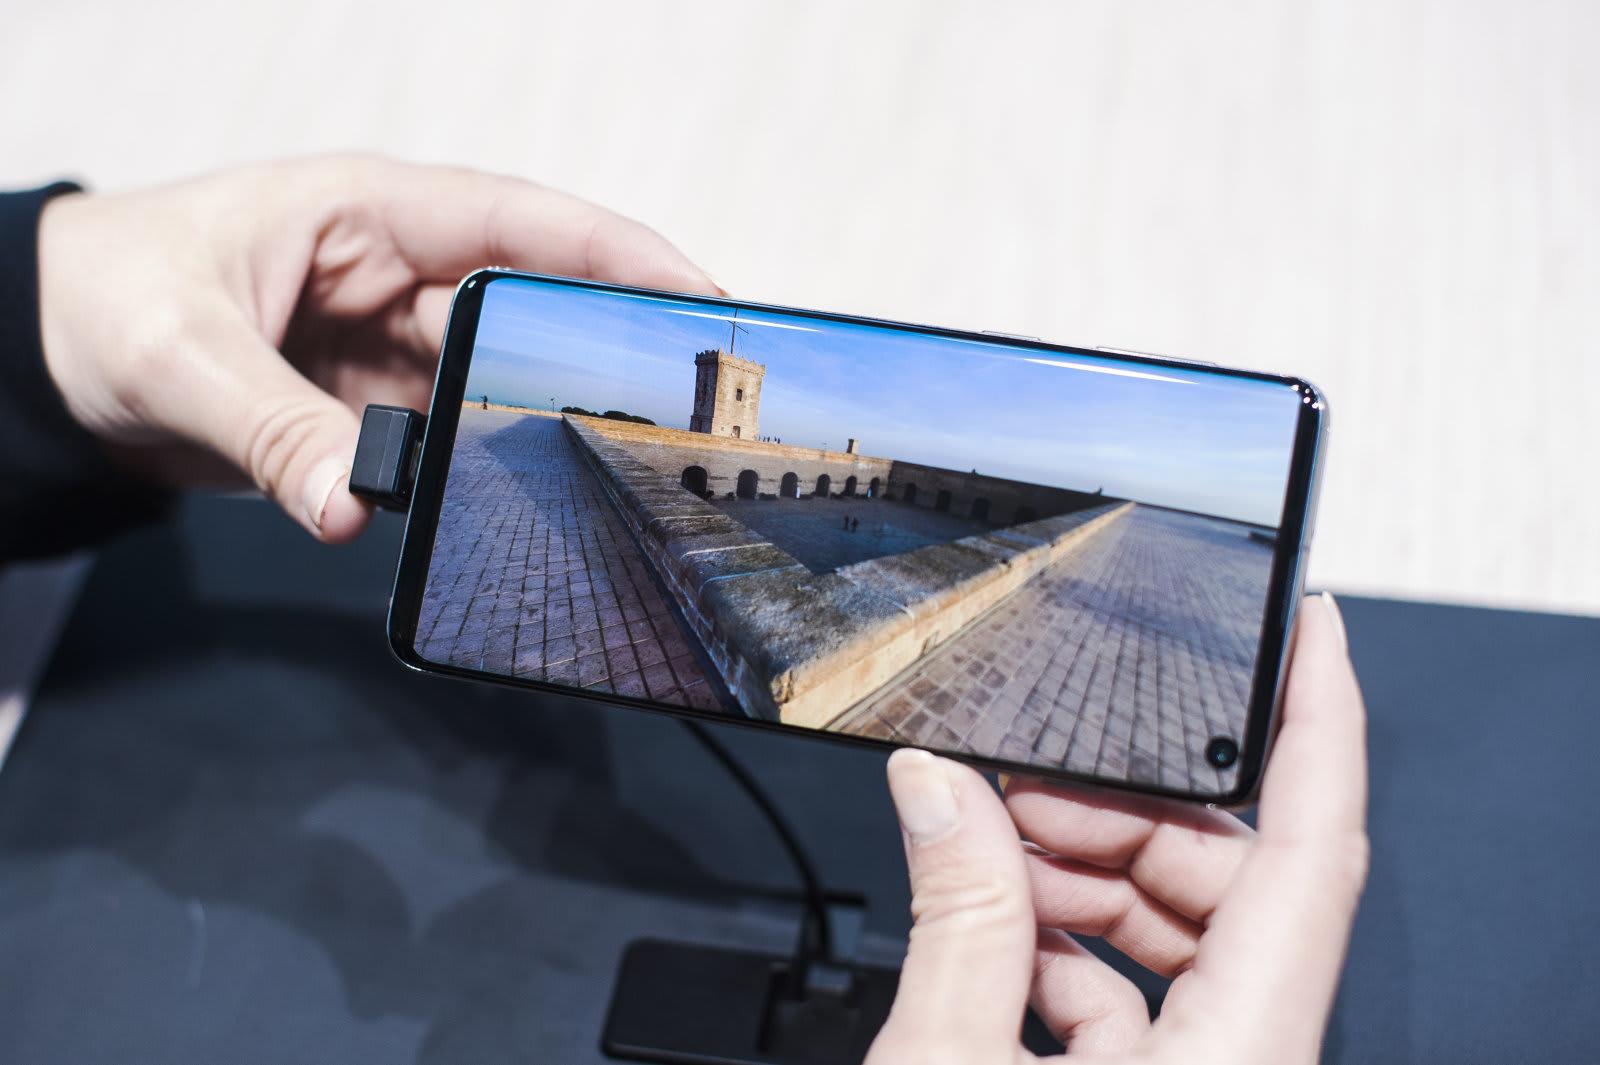 Samsung Full Screen Smartphone